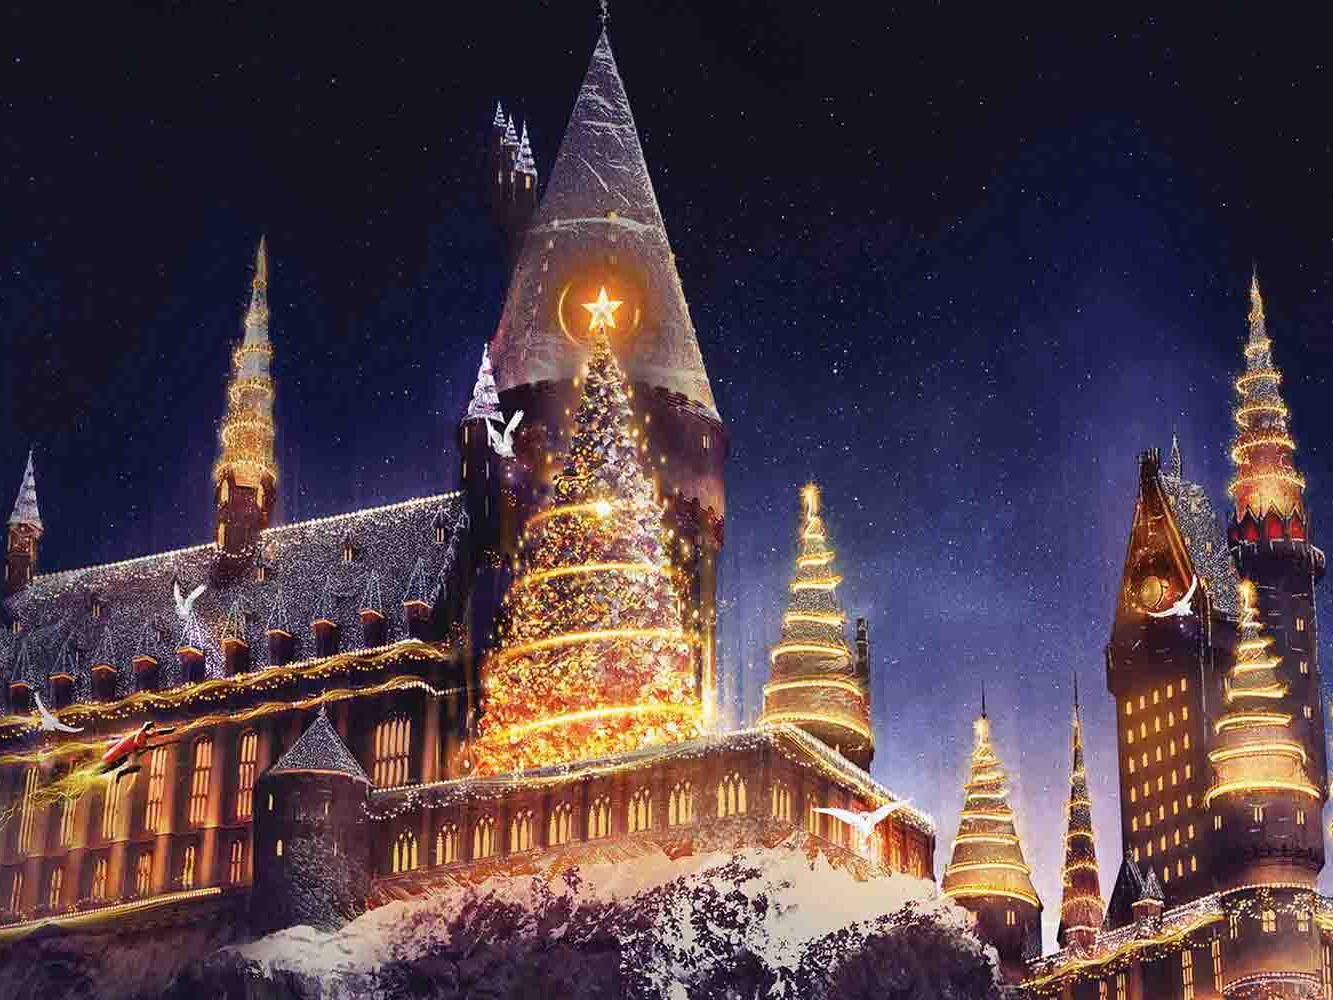 Harry Potter Christmas & Grinchmas: Universal Studios Hollywood